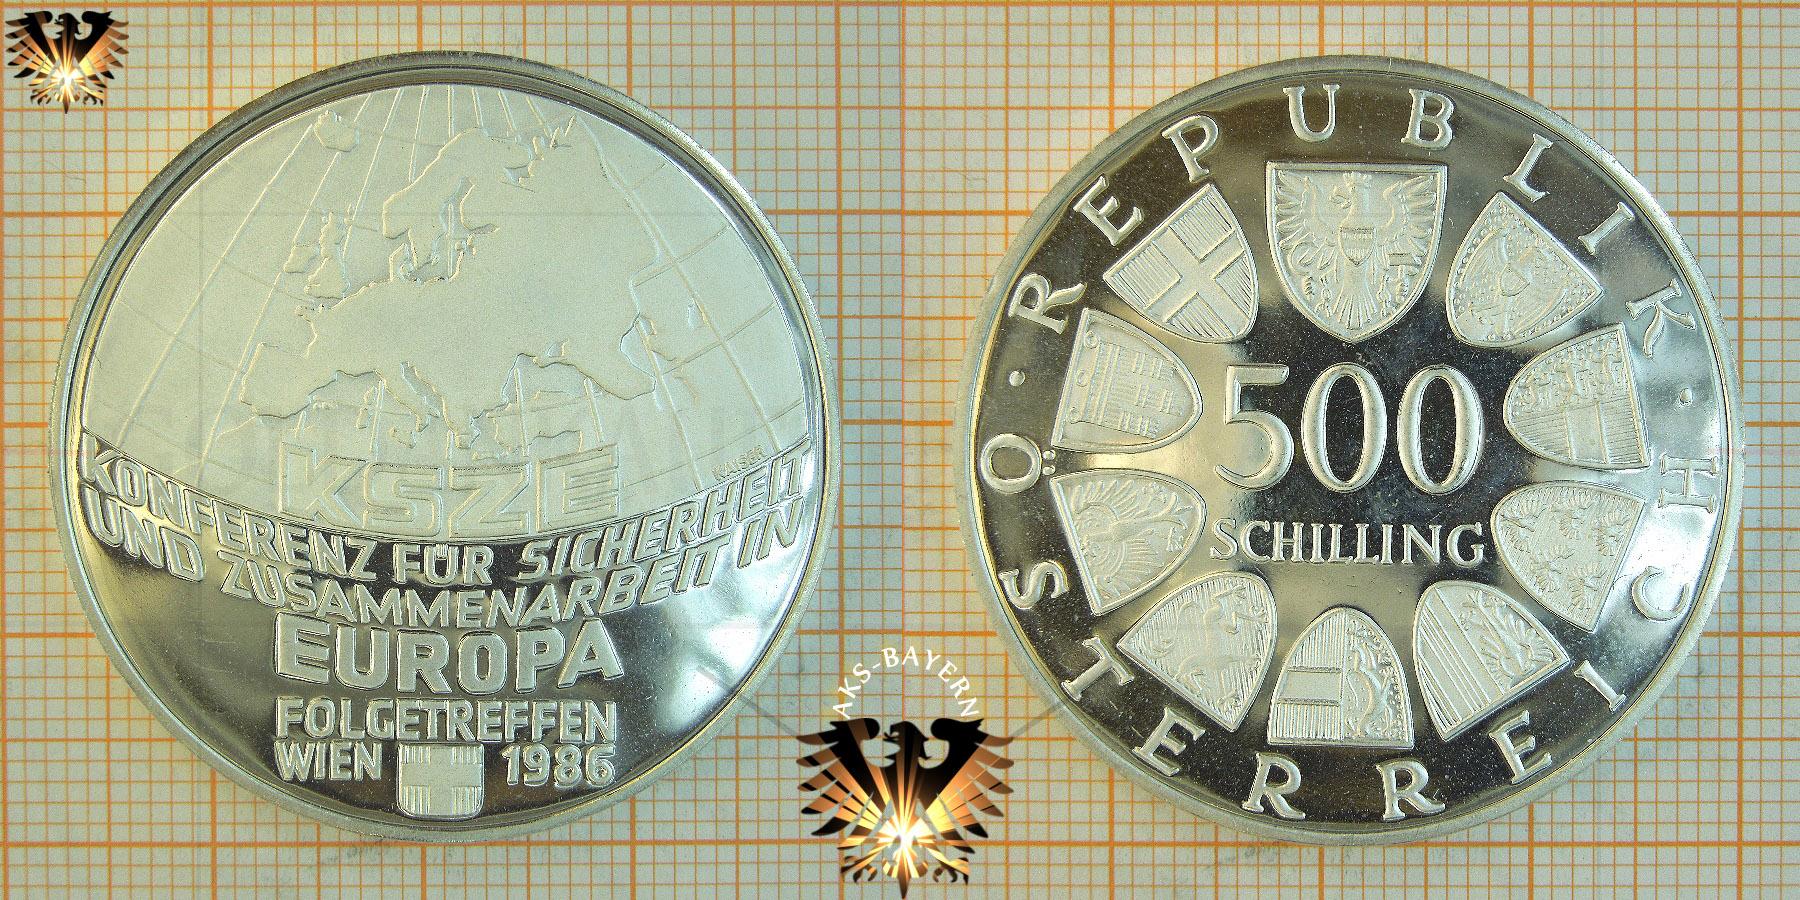 500 Schilling 1986 Ksze Europa Konferenz Silber österreich